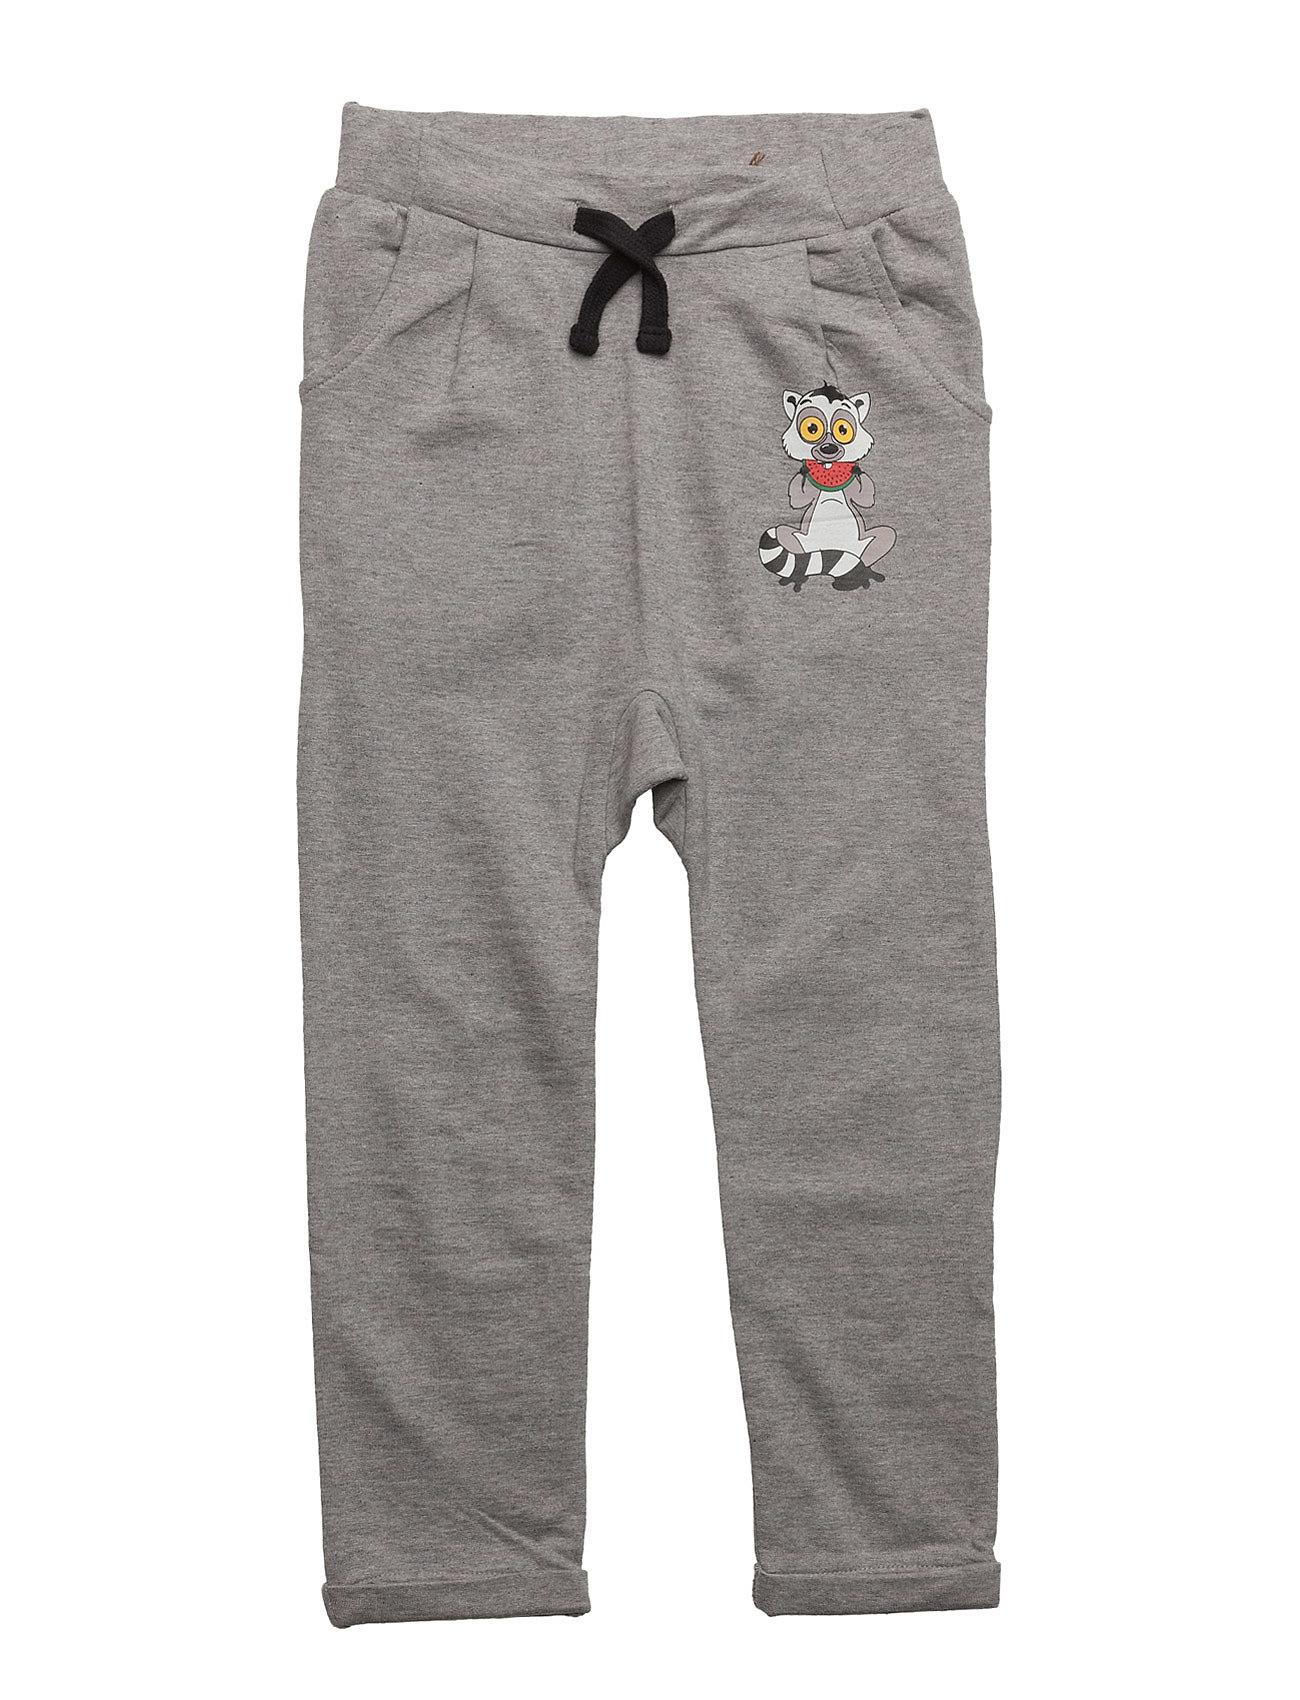 tao & friends Sweatpants lemuren single-animal grey på boozt.com dk